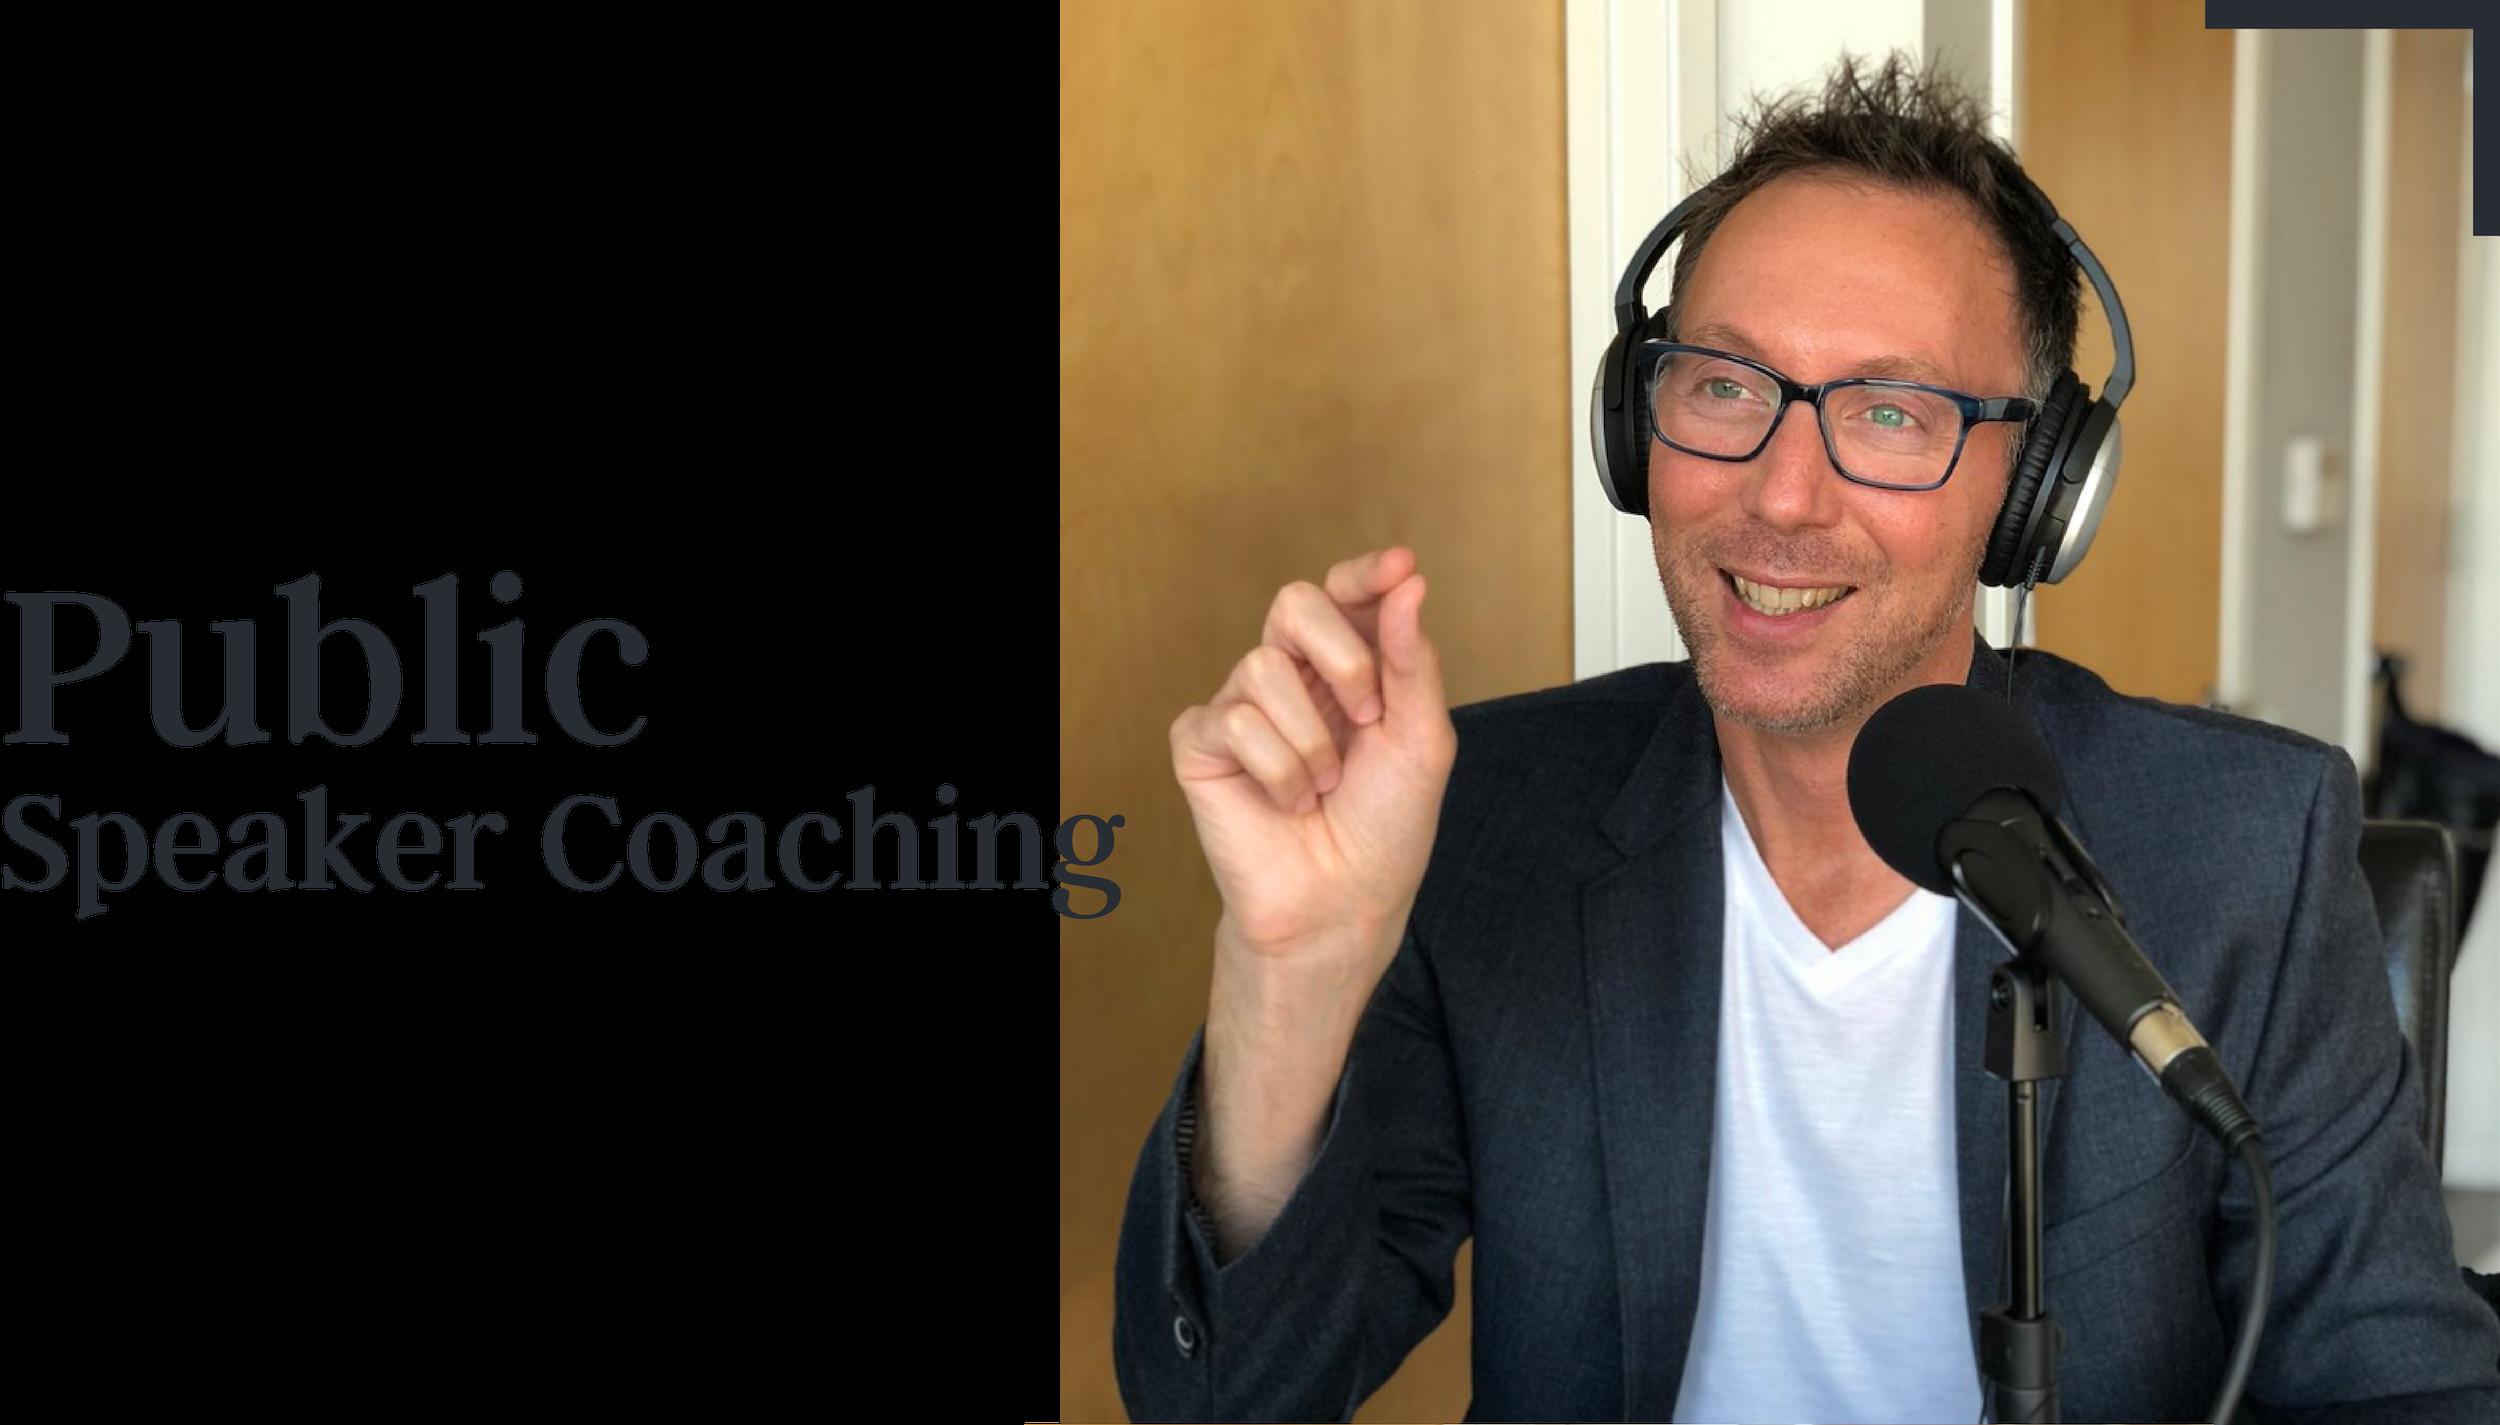 Public Speaker Coaching